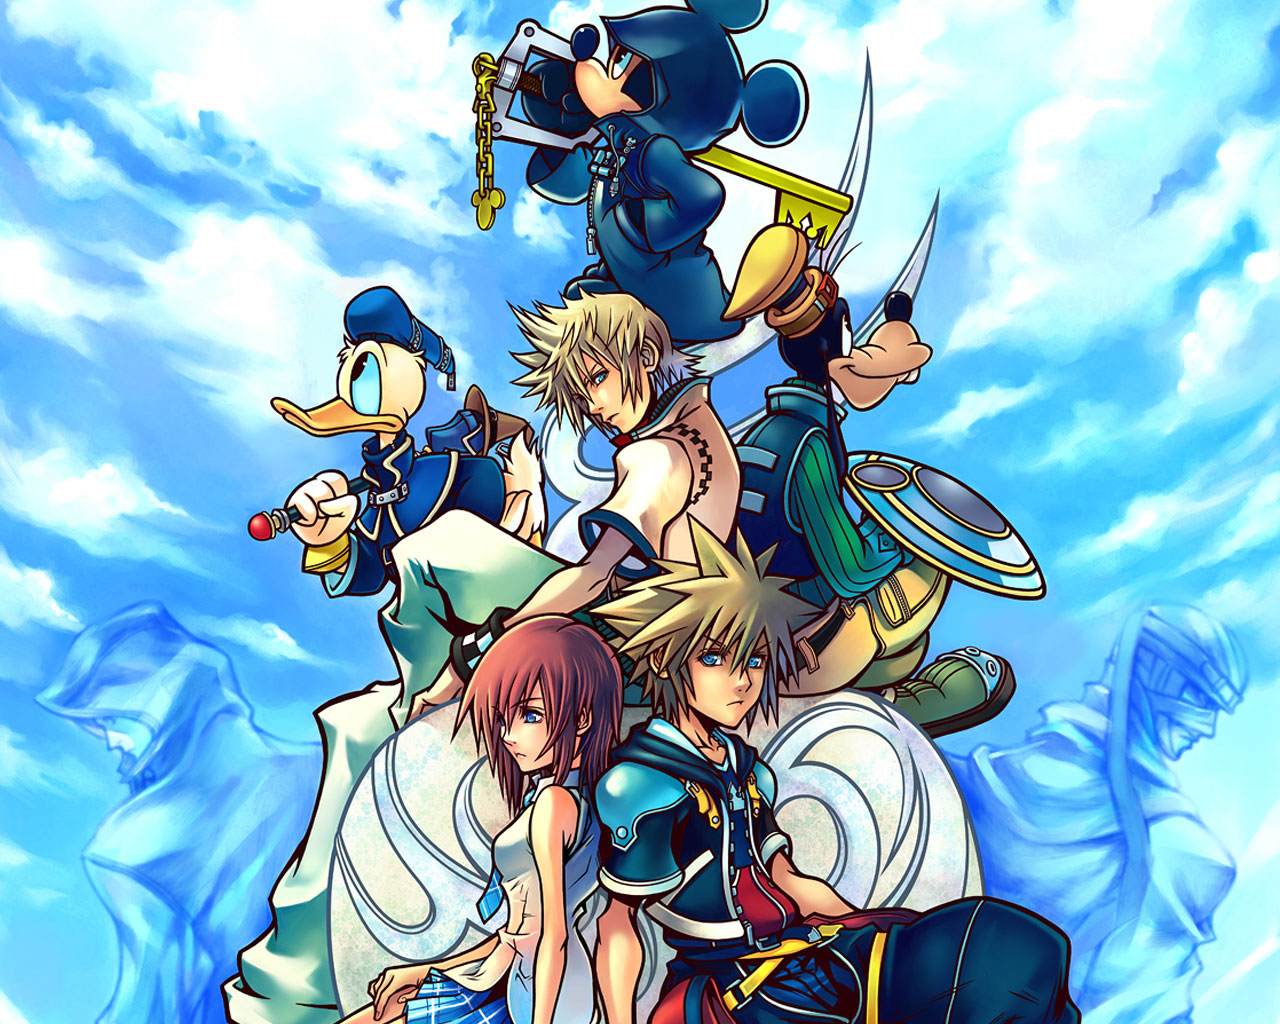 Kingdom Hearts II Wallpaper / Desktop Backgrounds - Creative Uncut